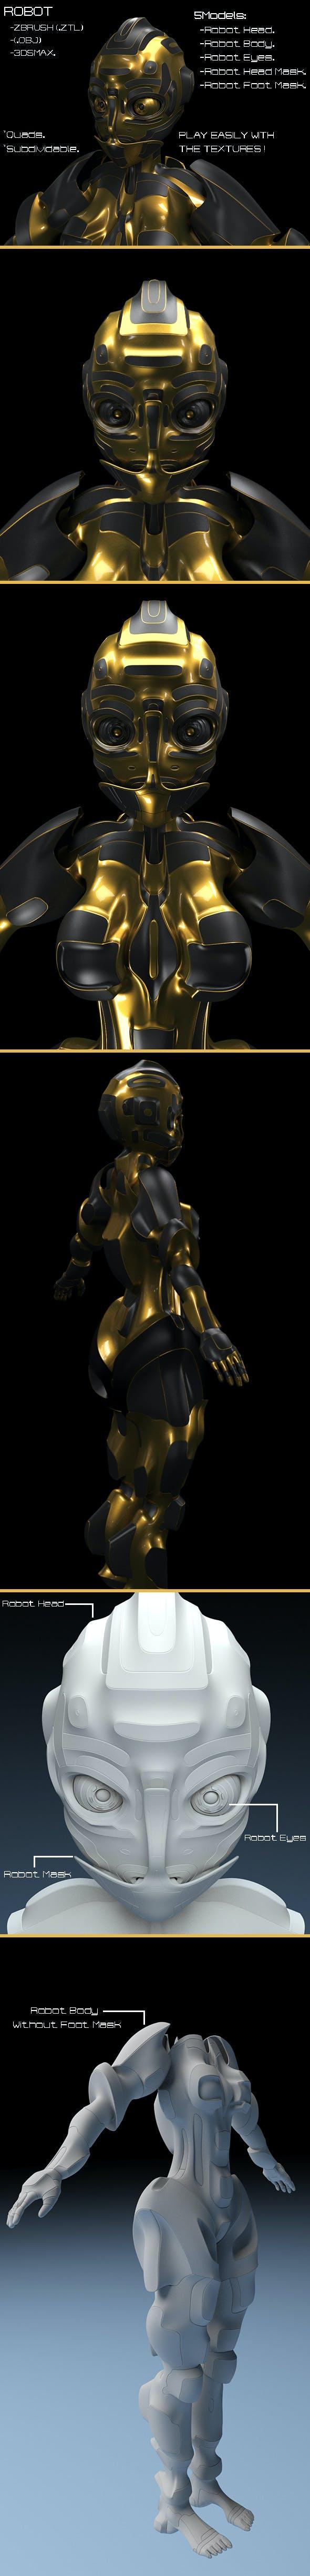 Robot. - 3DOcean Item for Sale